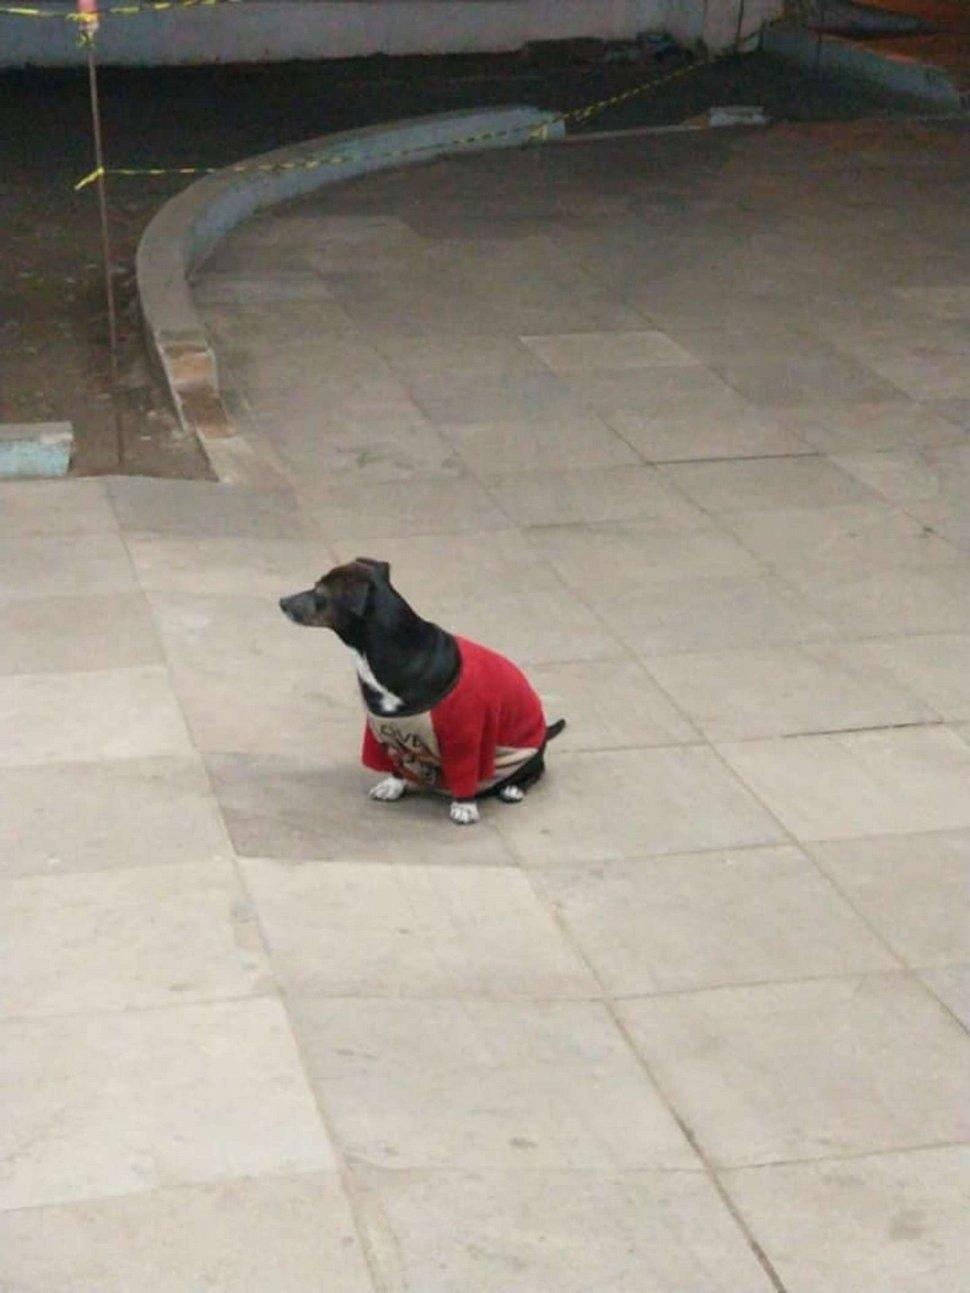 https://www.ipnoze.com/wordpress/wp-content/uploads/2020/10/chien-ambulance-suit-maitre-hopital-anderson-bahi-004.jpg